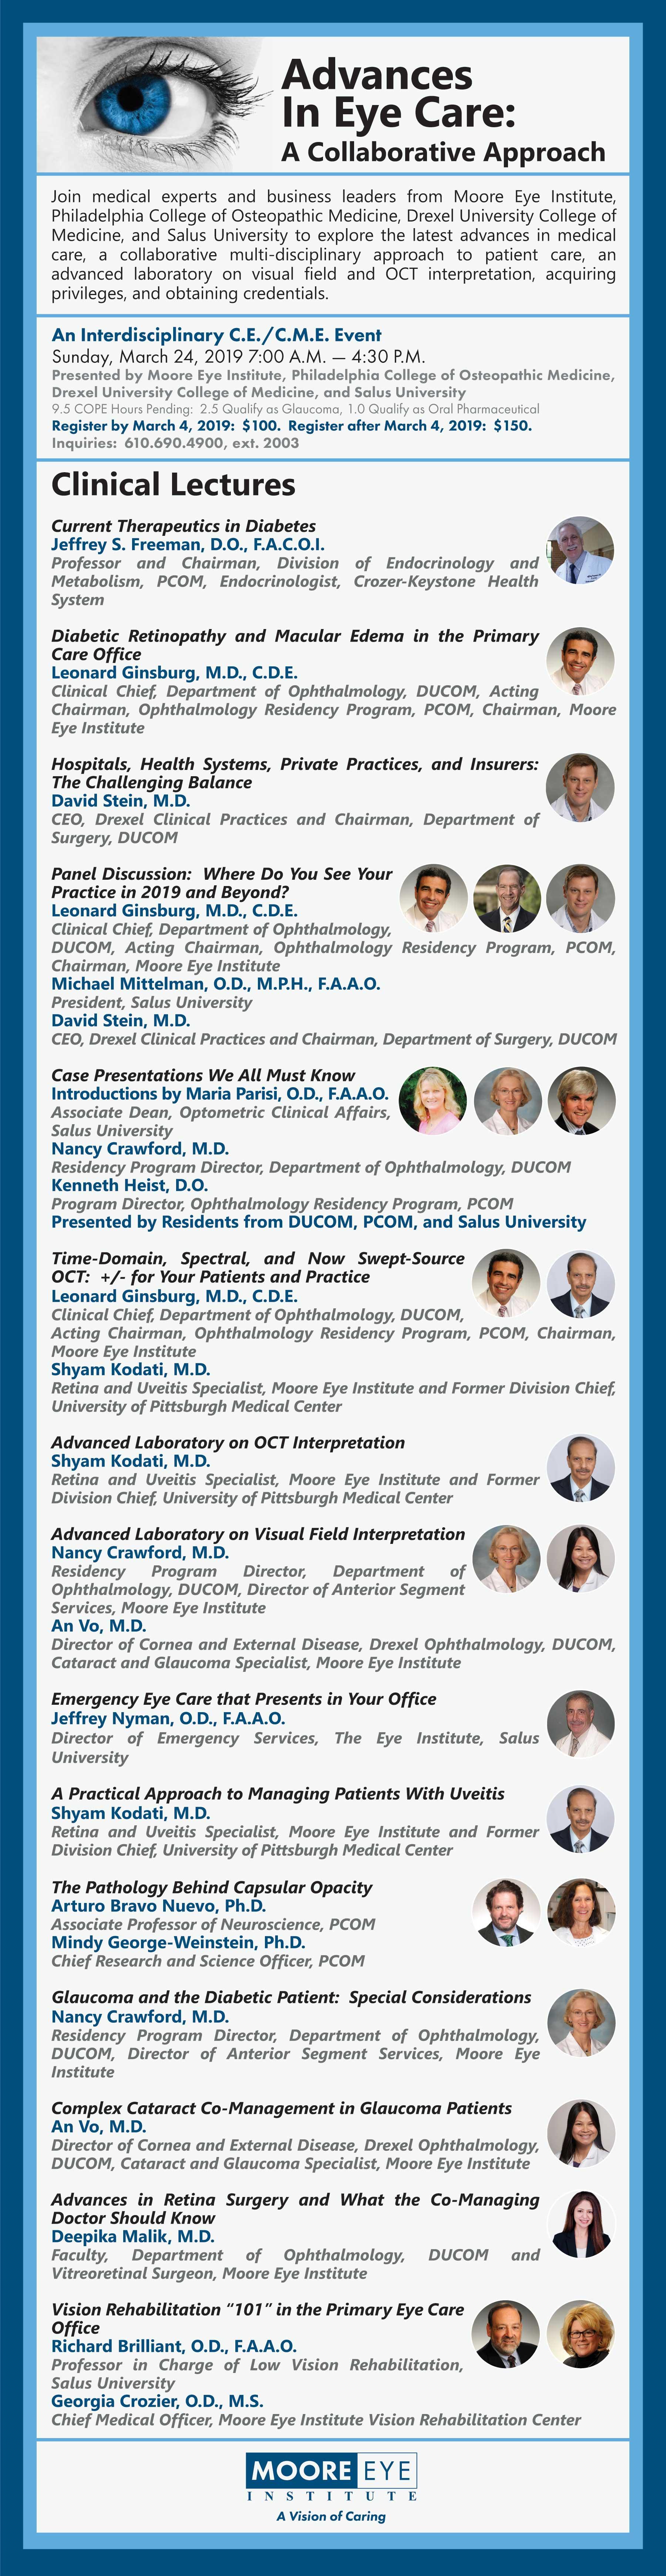 Advances in Eye Care: A Collaborative Approach Program